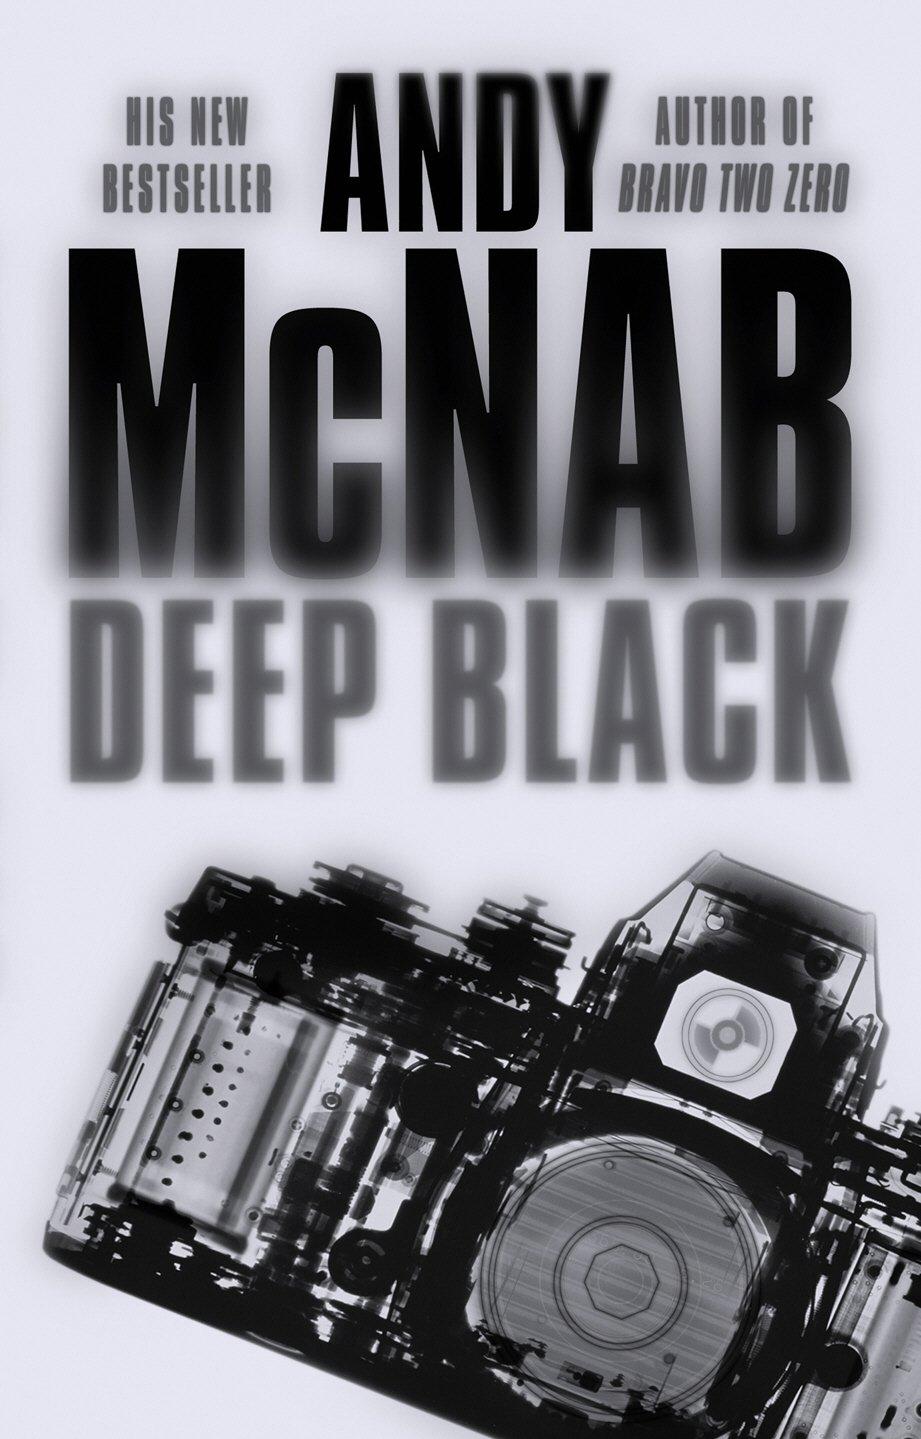 Deep Black Andy McNab